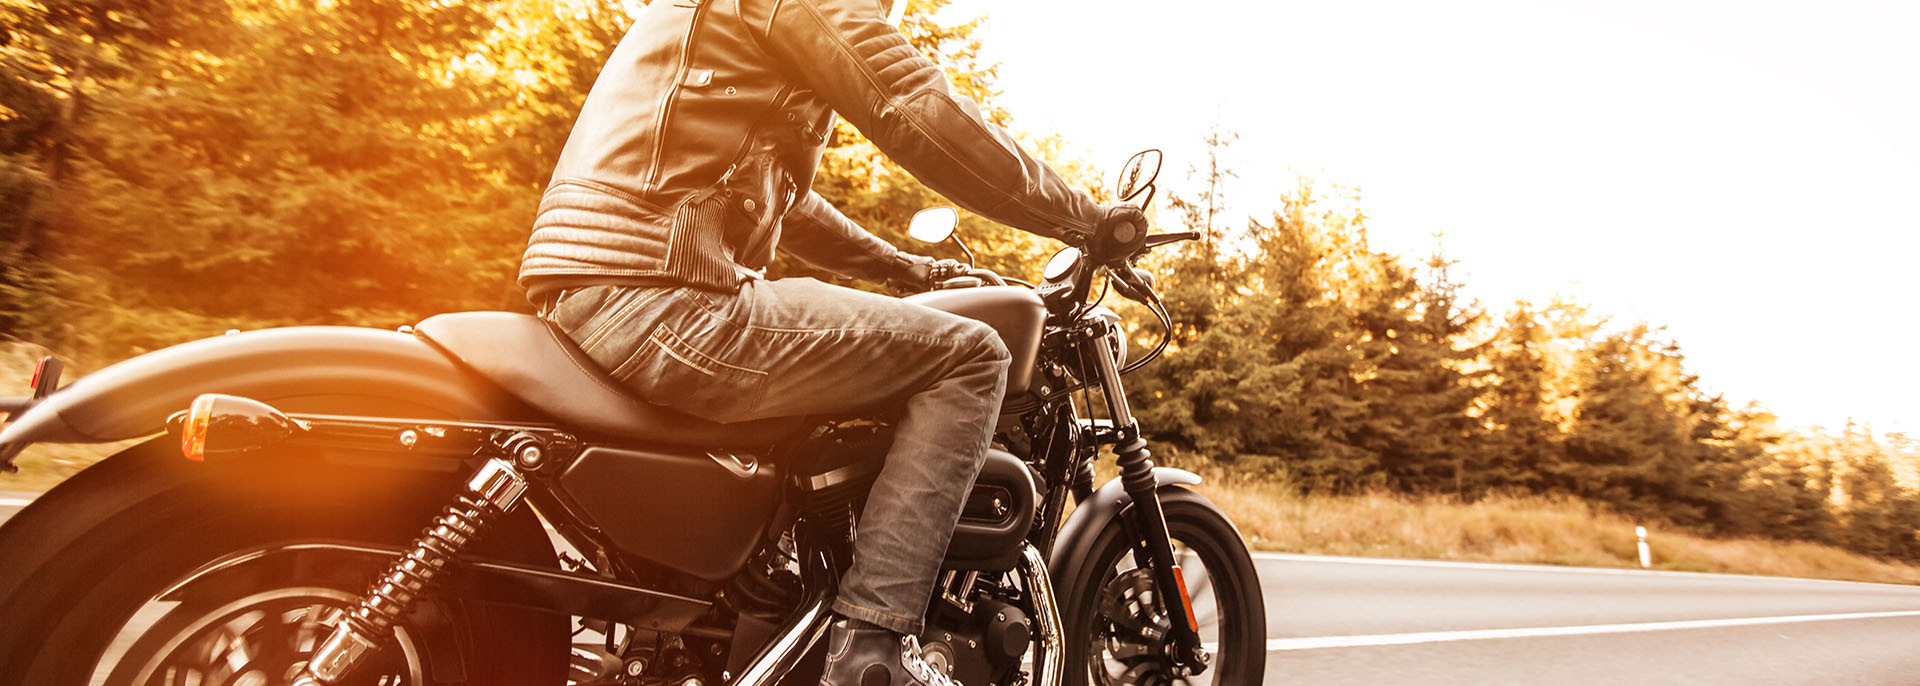 Sacramento Motorcycle Accident Lawyer | Law Office of John J  Moreno